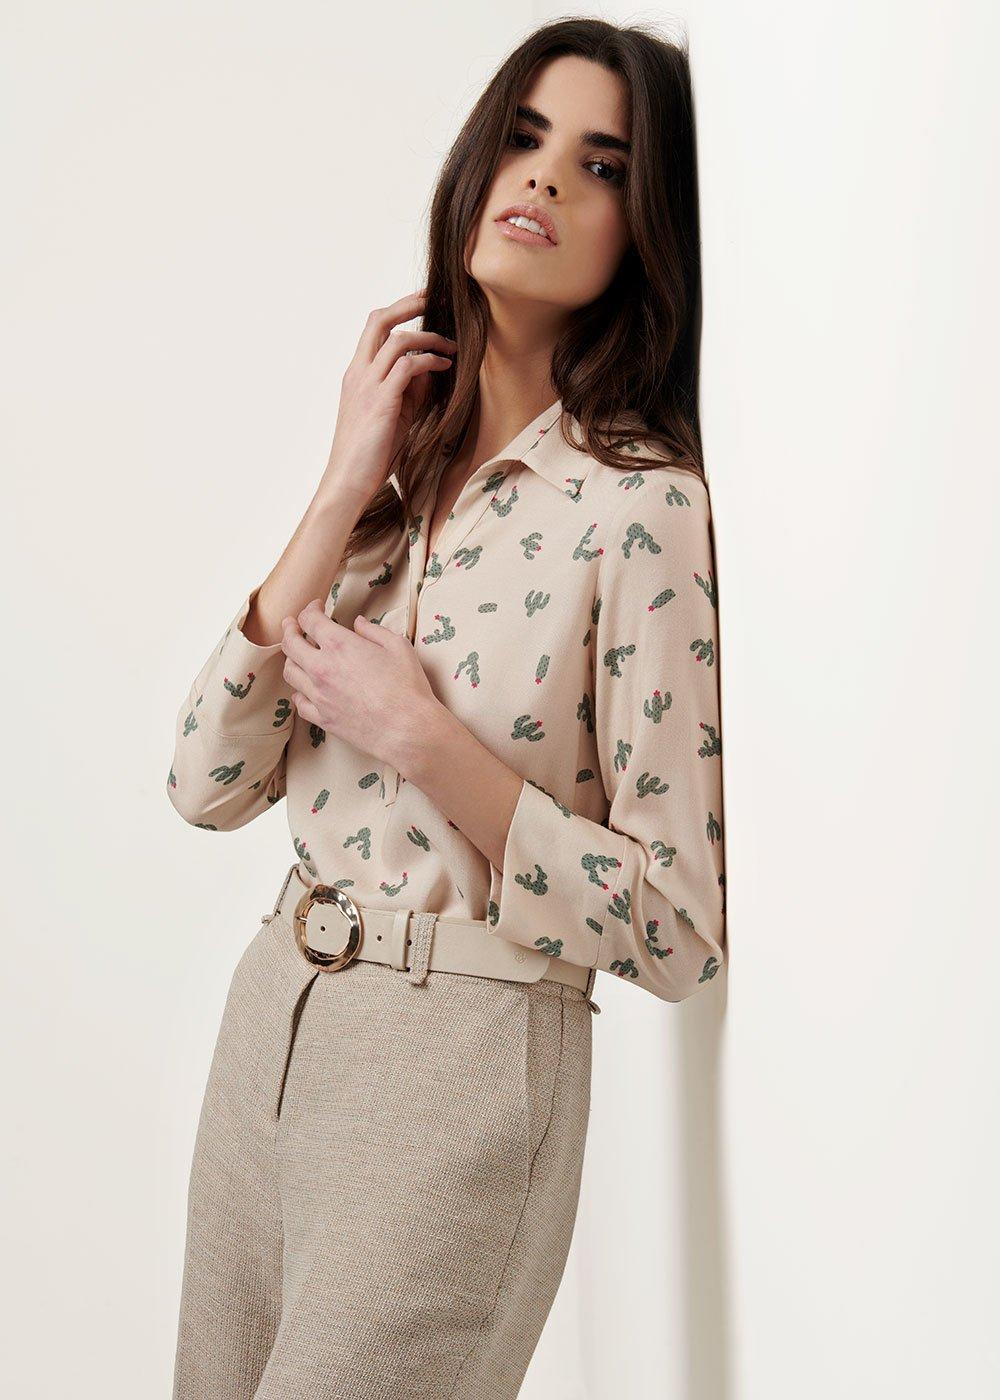 Angela shirt with cactus print